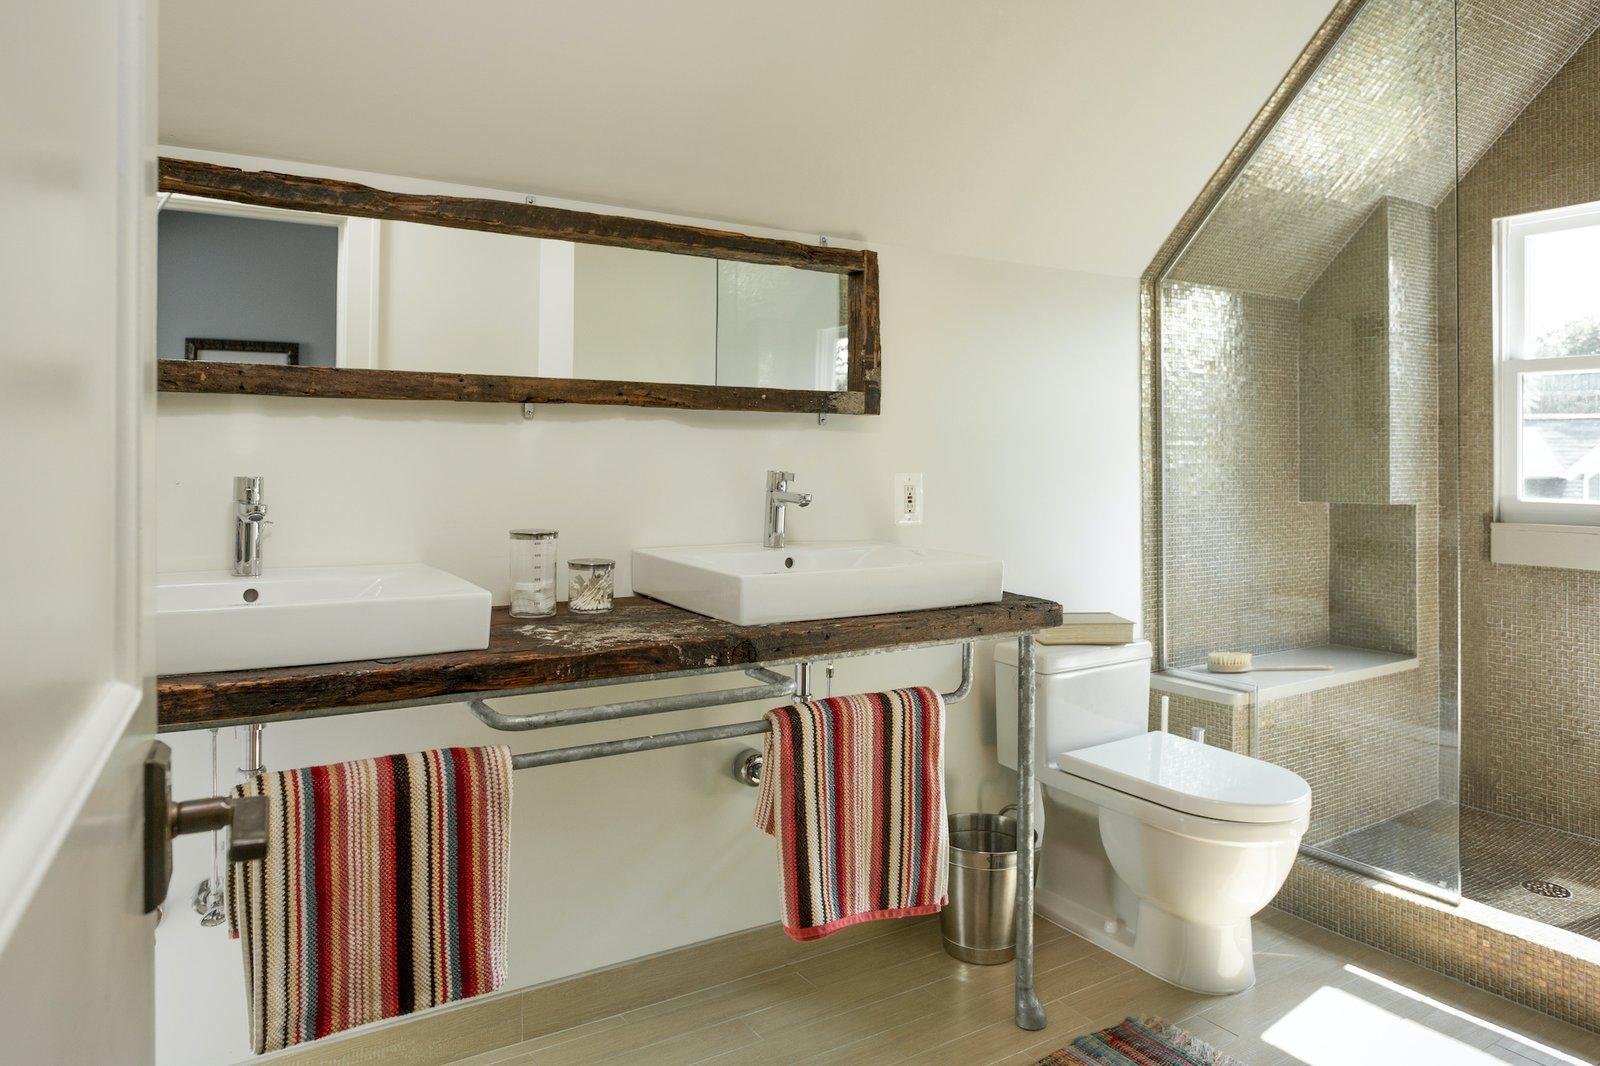 Bathroom at Birmingham Residence by McIntosh Poris Associates.